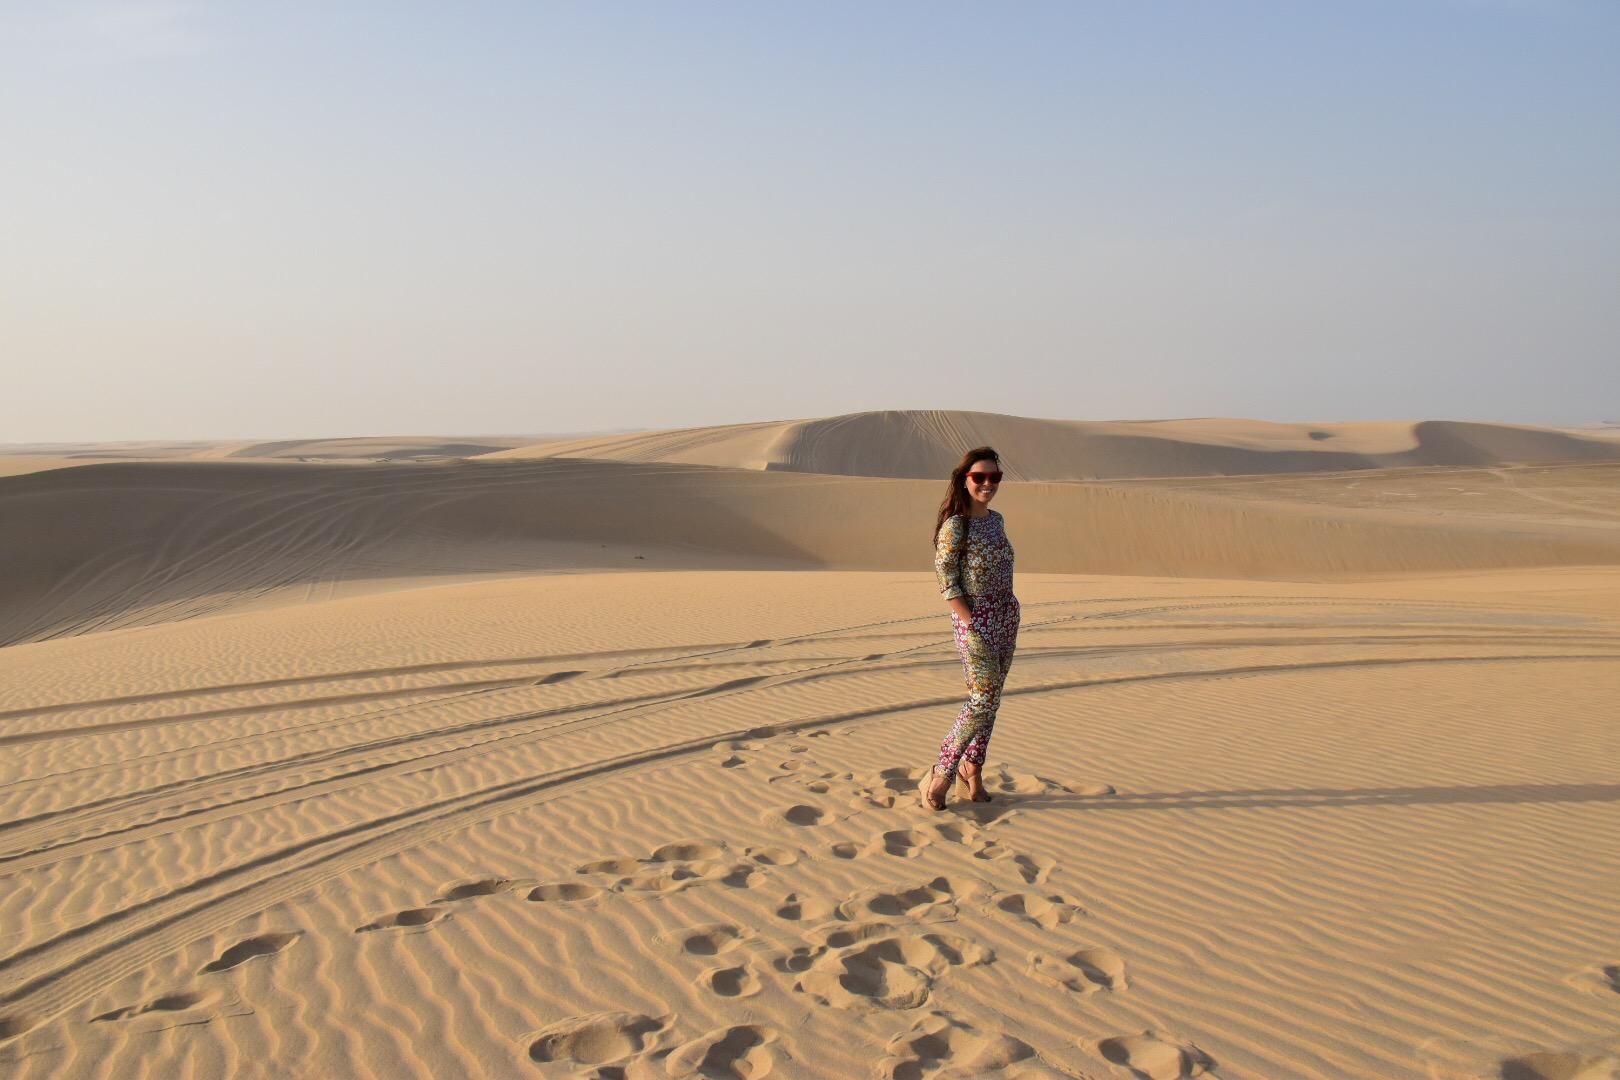 Monique Lhuillier travel diary: Casual walk through the desert!